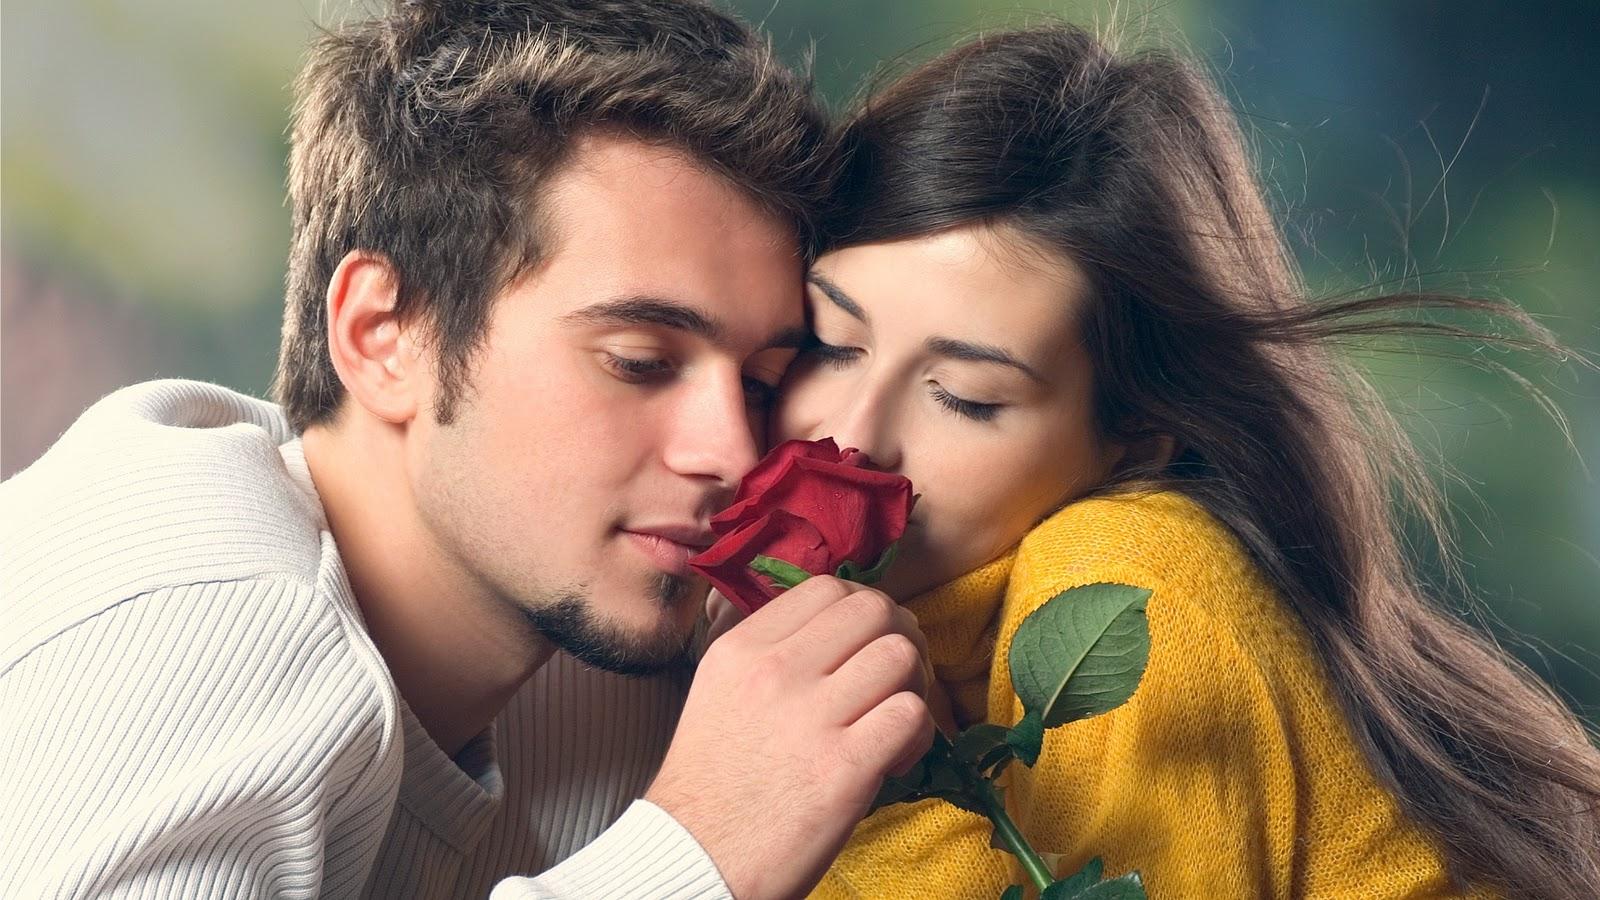 http://1.bp.blogspot.com/-R37qPpA_oDA/TqgDTPTu7kI/AAAAAAAAA0U/5LG0_9B1G2g/s1600/couple_in_love_wallpaper.jpg